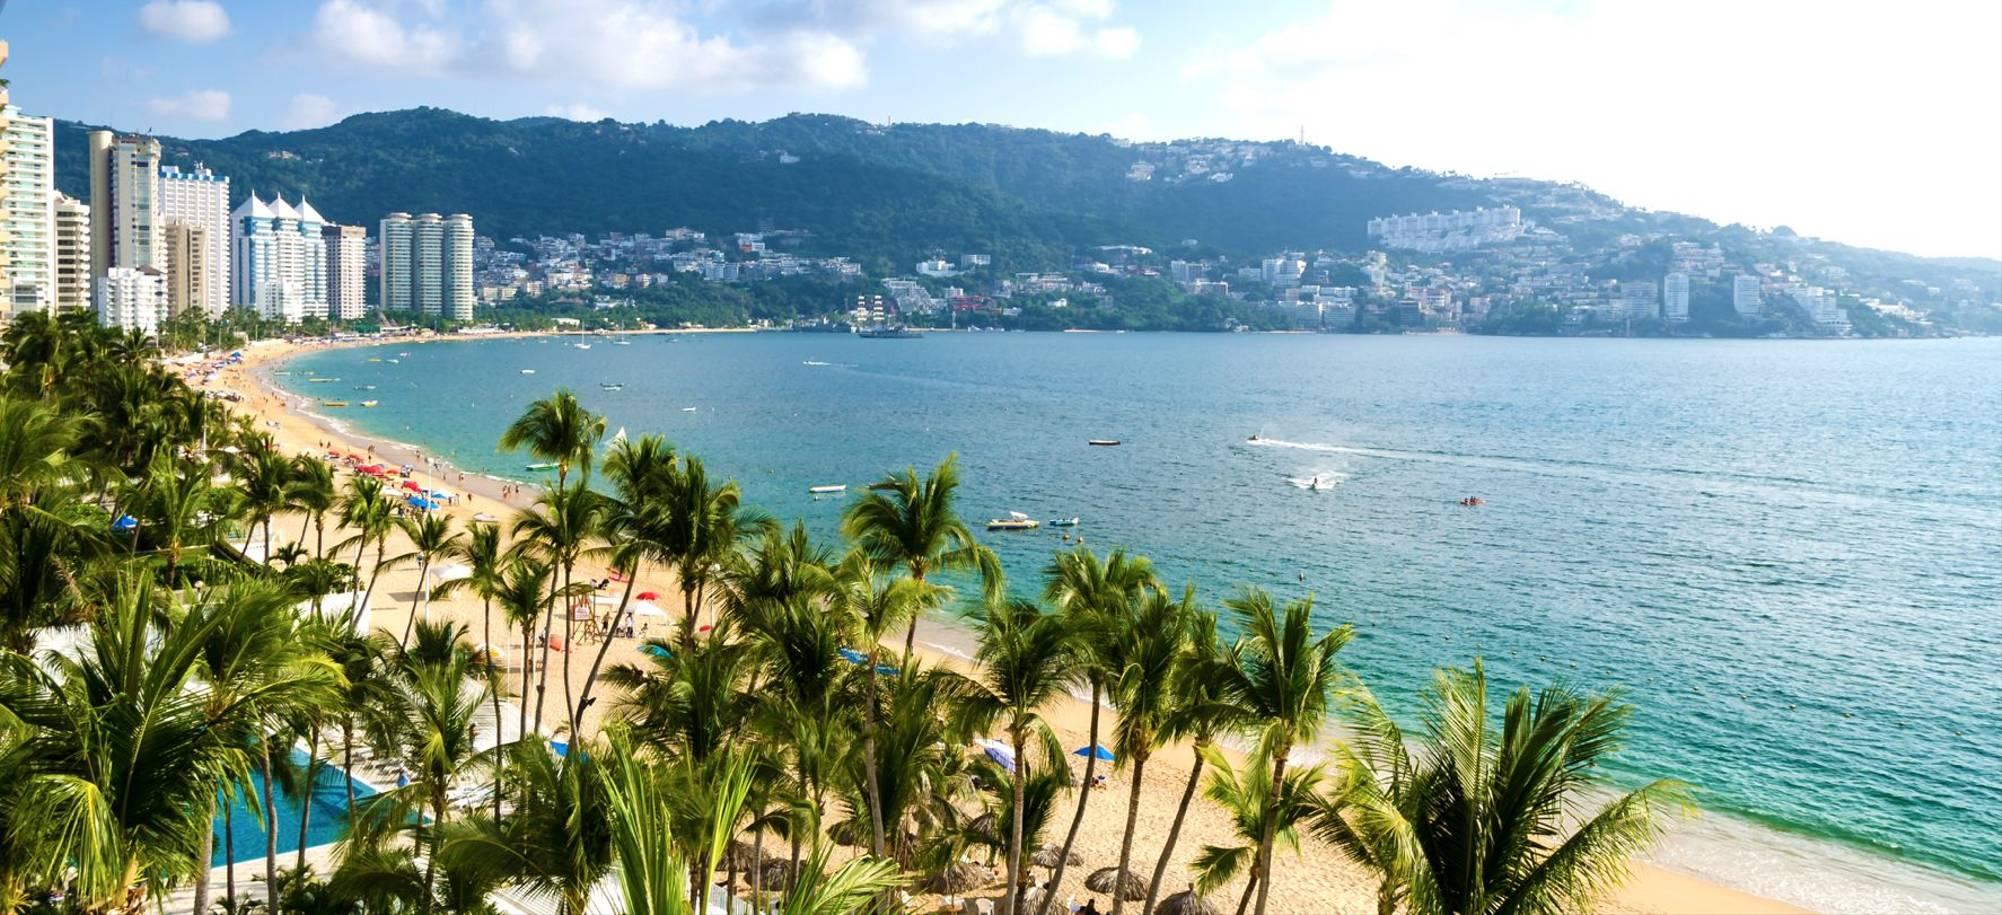 Acapulco - Itinerary Desktop.jpg